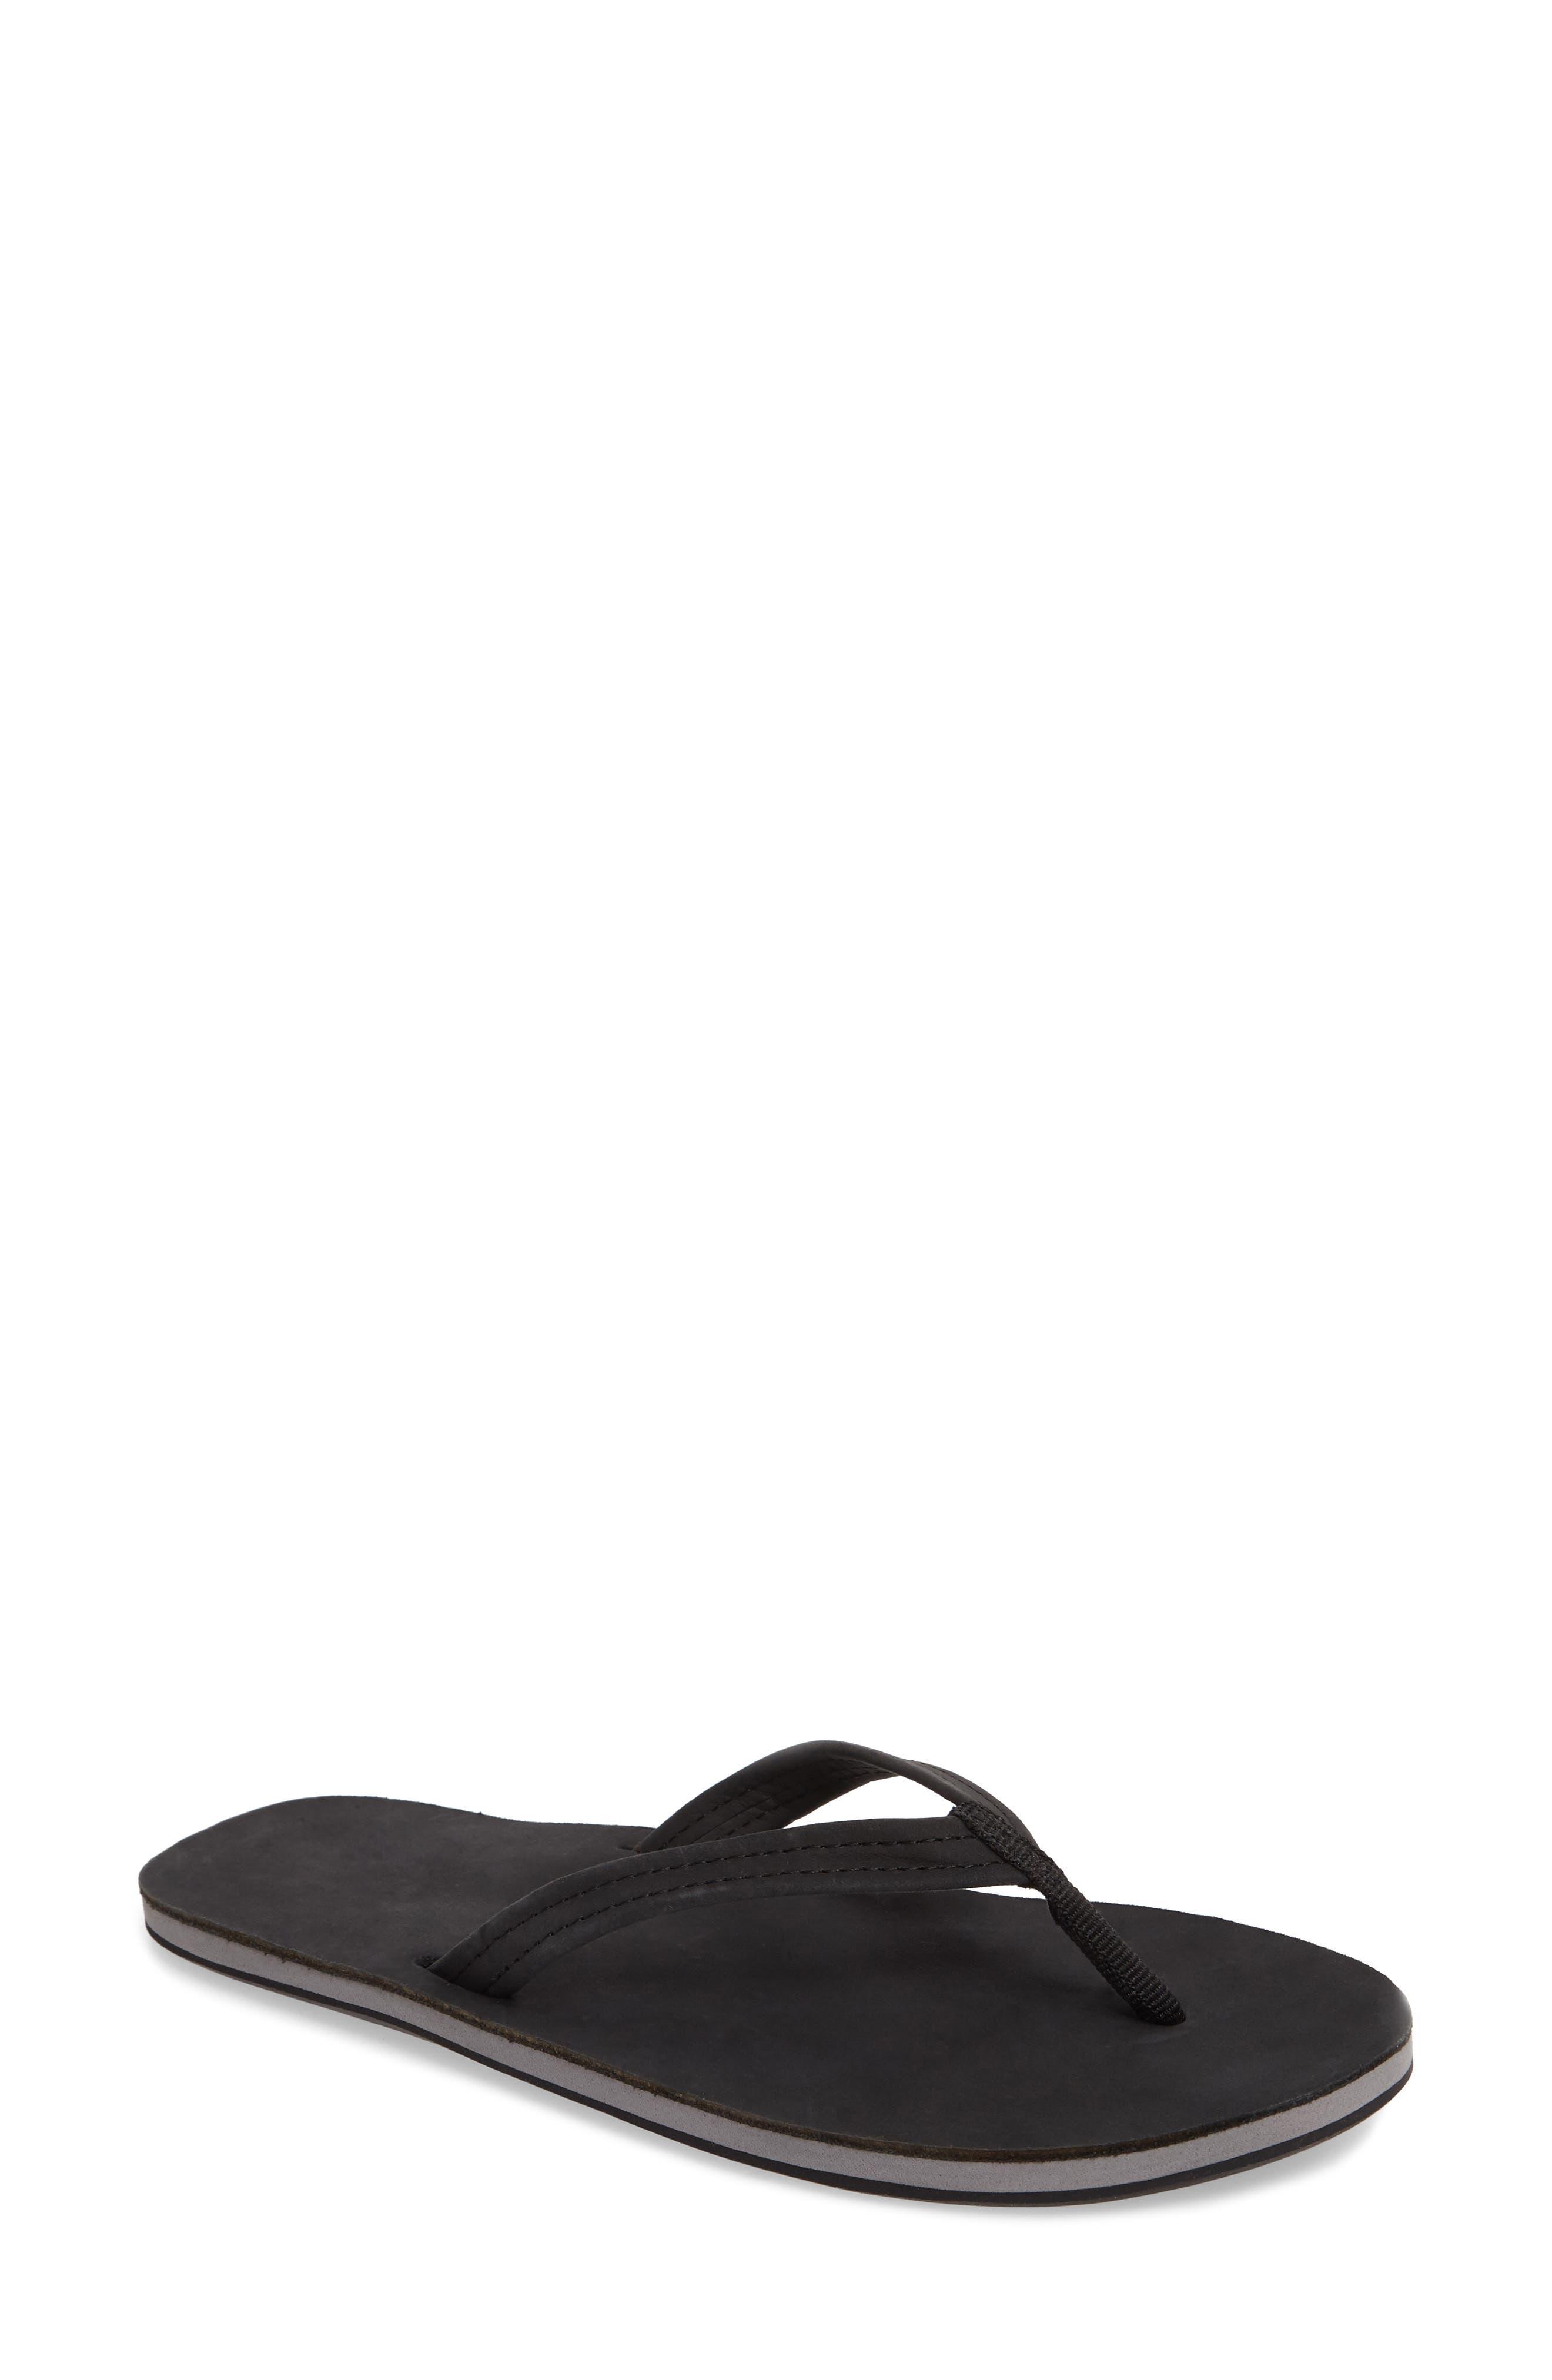 Fields Flip Flop,                         Main,                         color, Black/ Seafoam/ Black